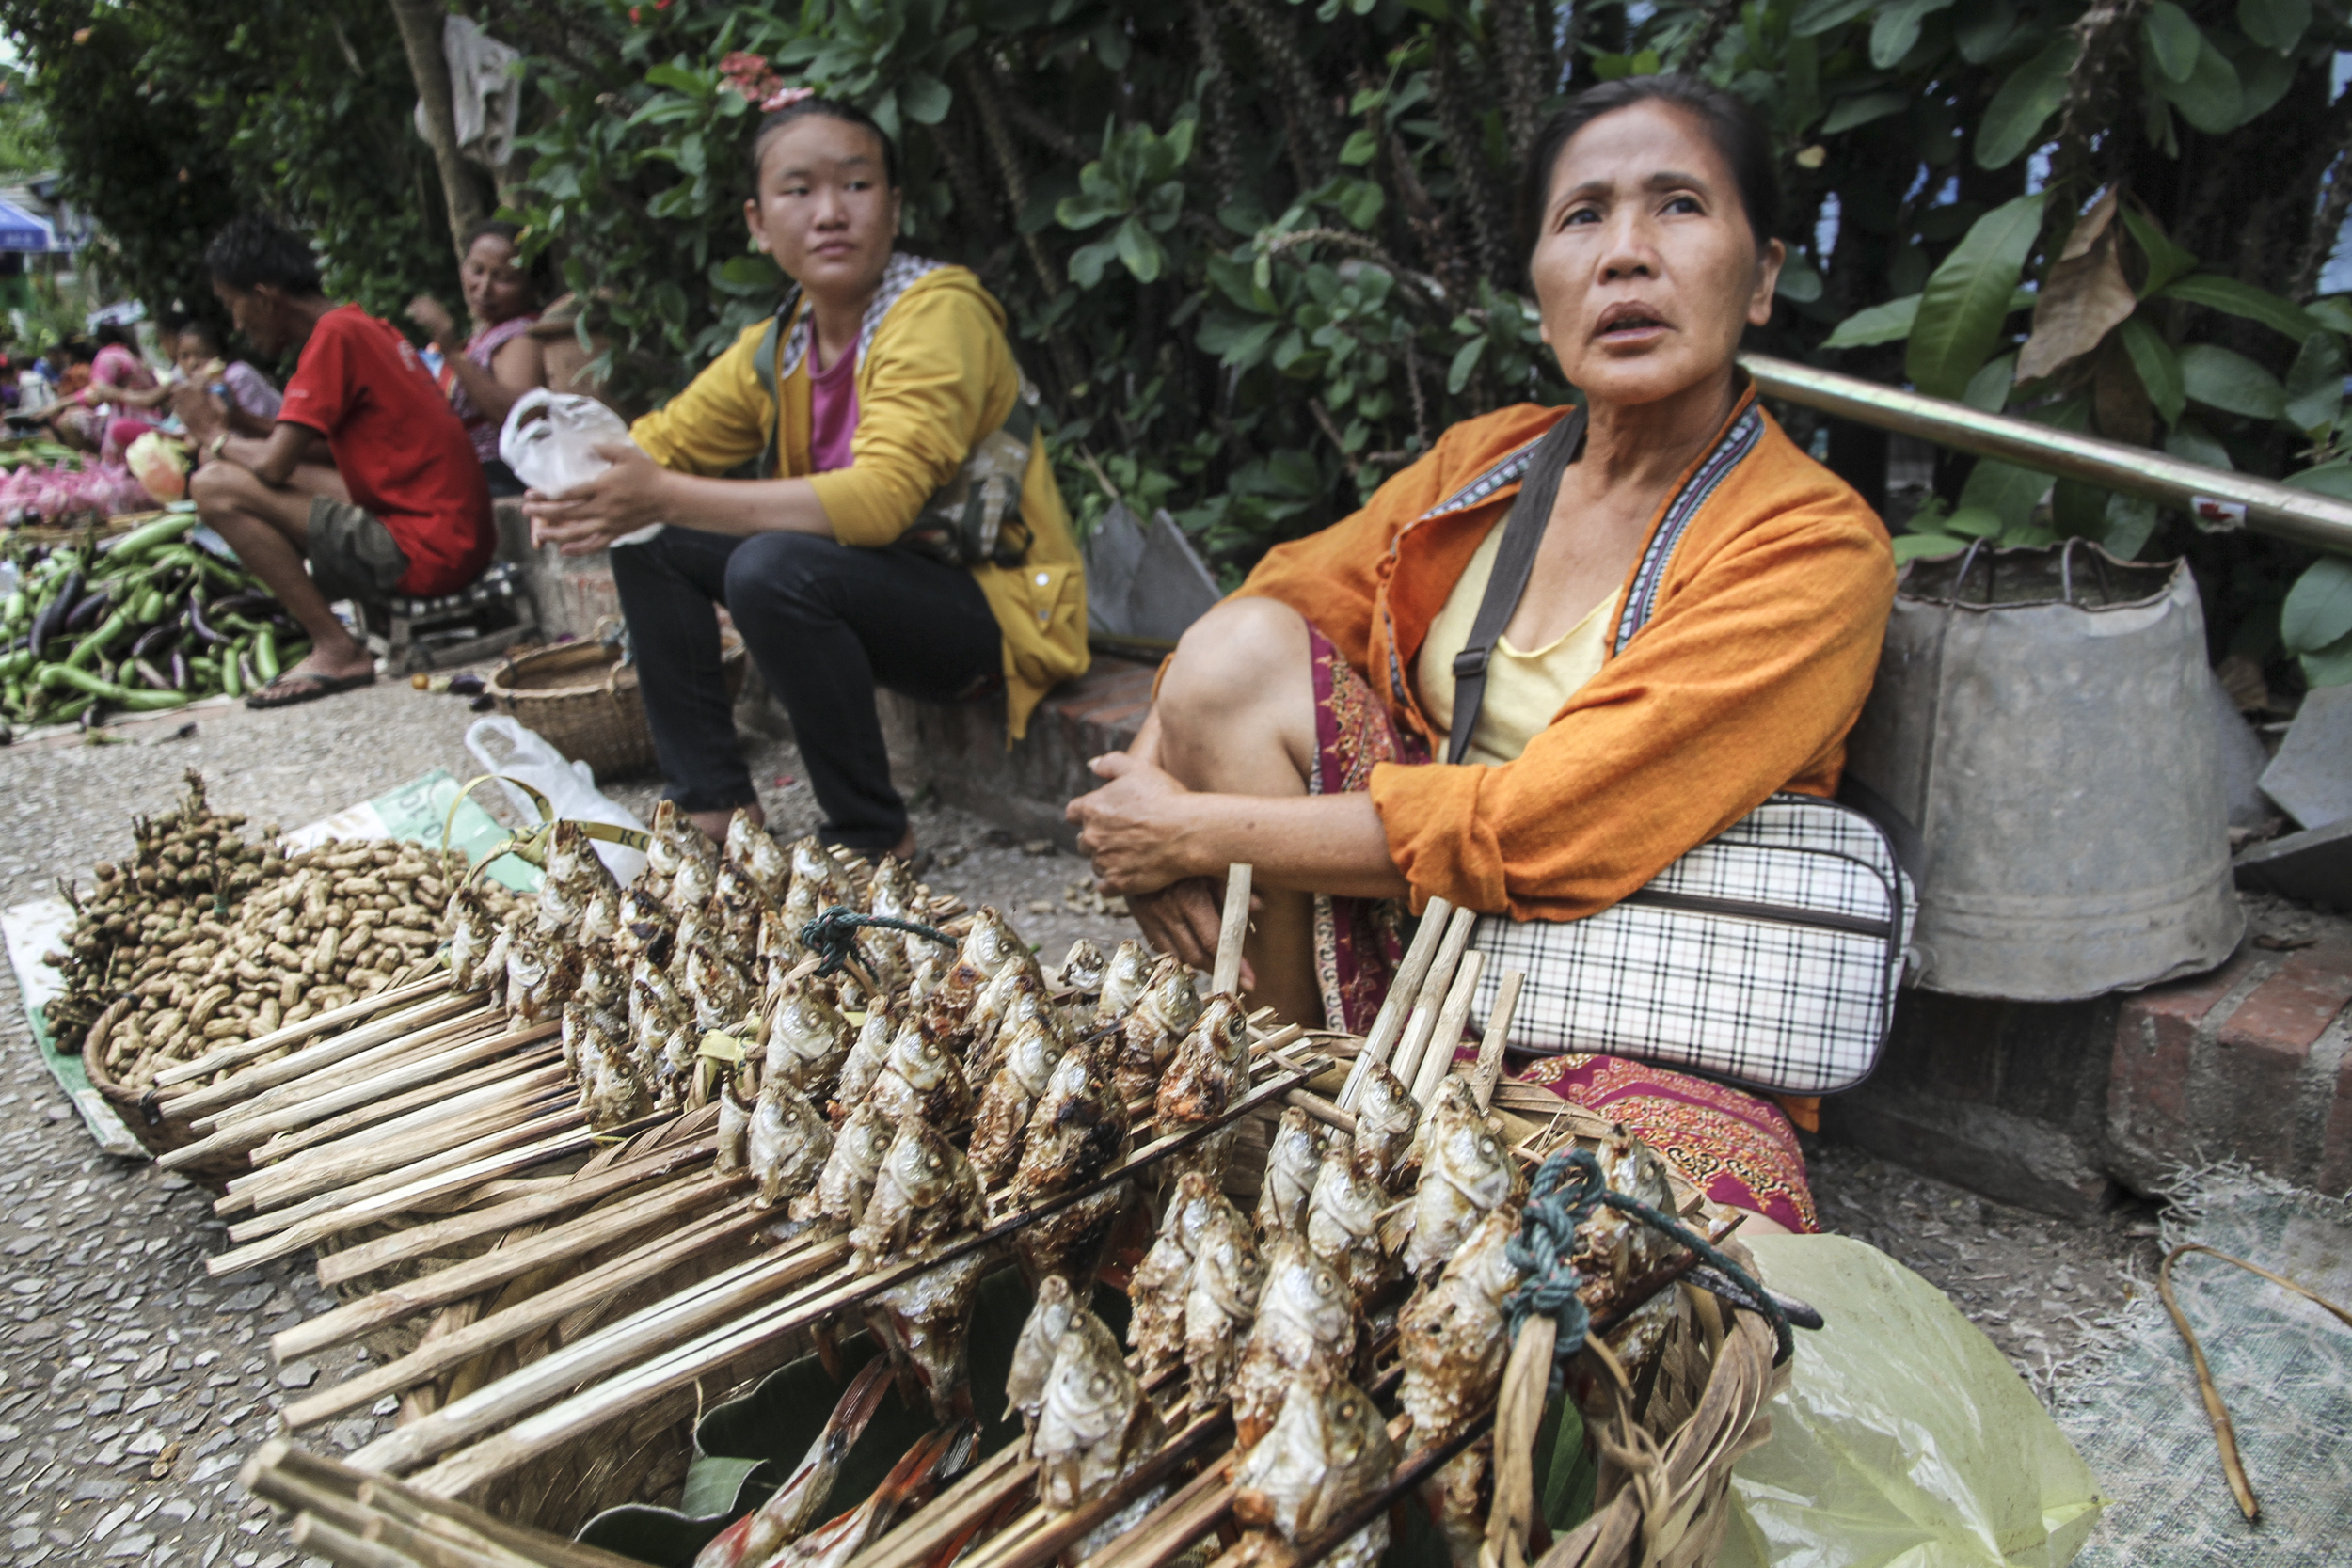 Selling fish.  Phnom Penh, Cambodia